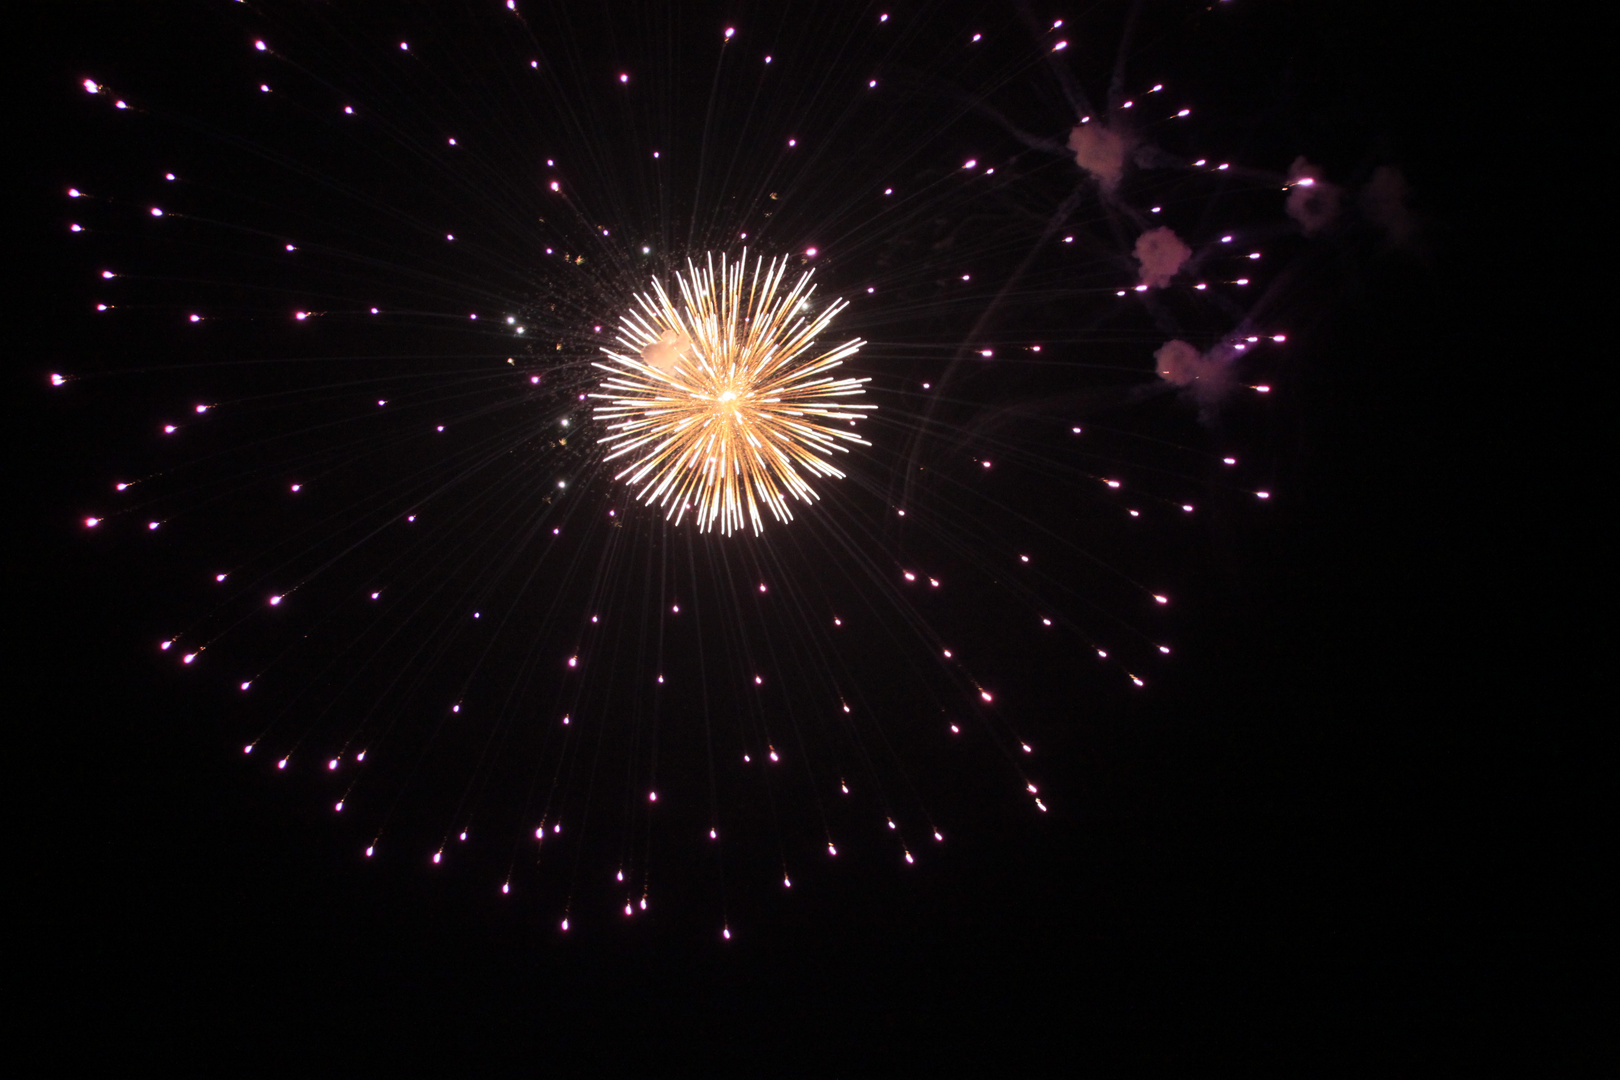 Feuerwerk 3 Oktober